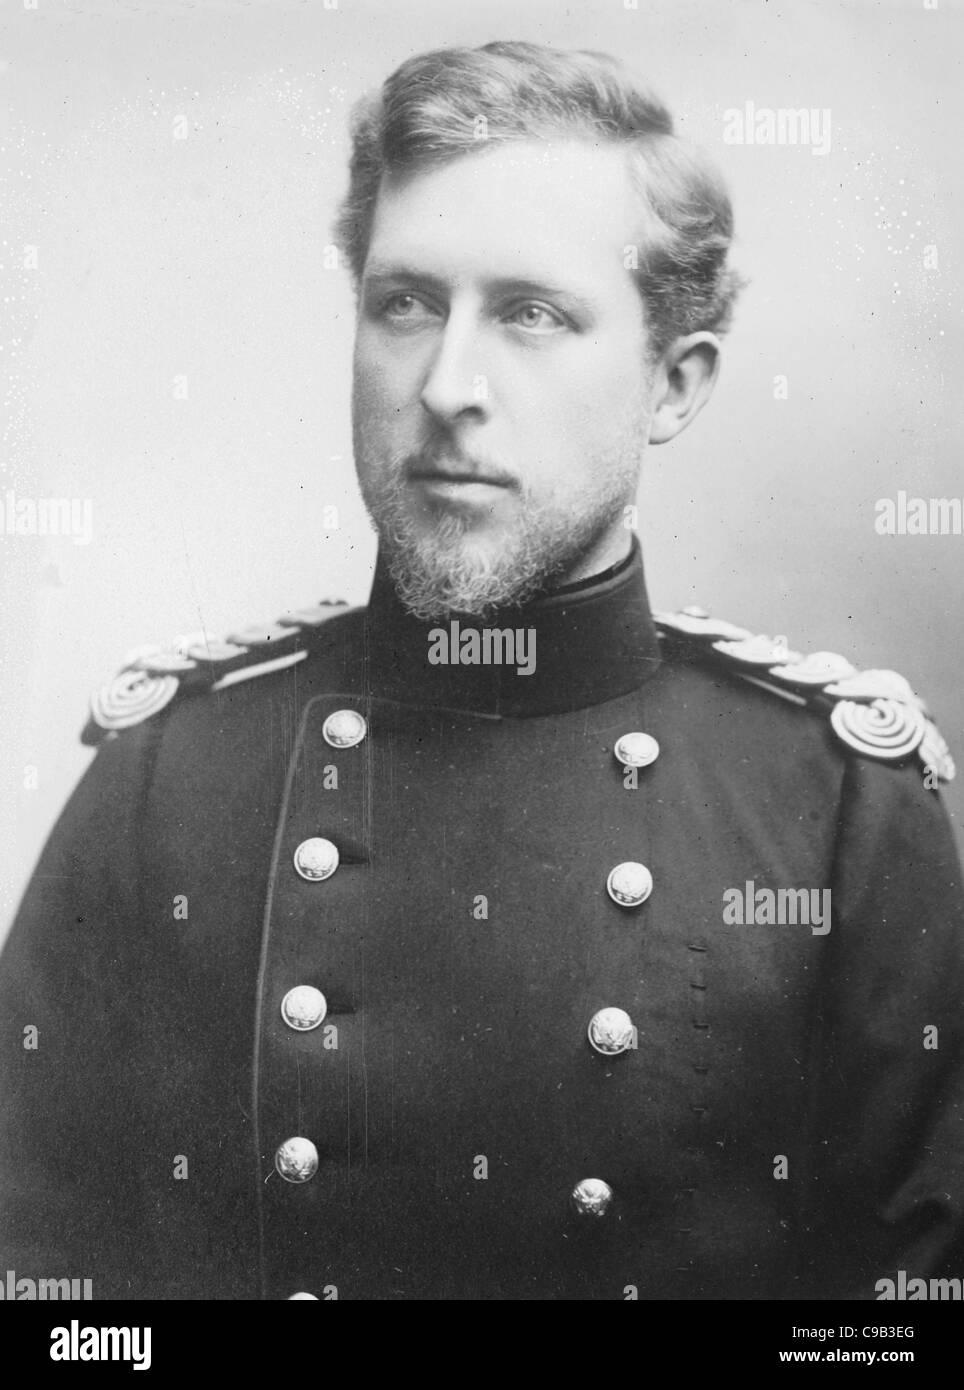 Prince Albert of Belgium - Stock Image